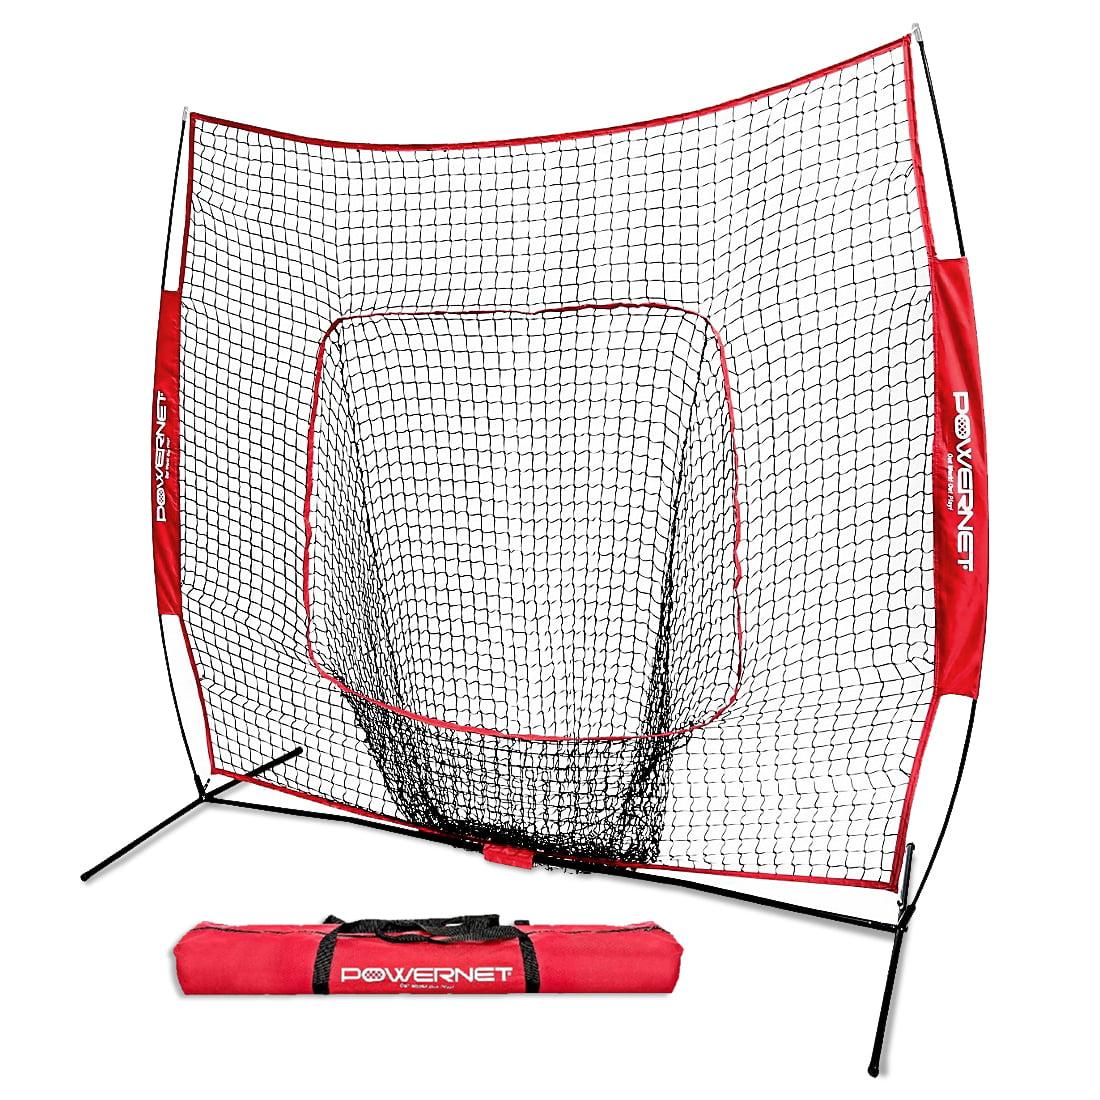 PowerNet 7x7 Baseball Softball Hitting Net